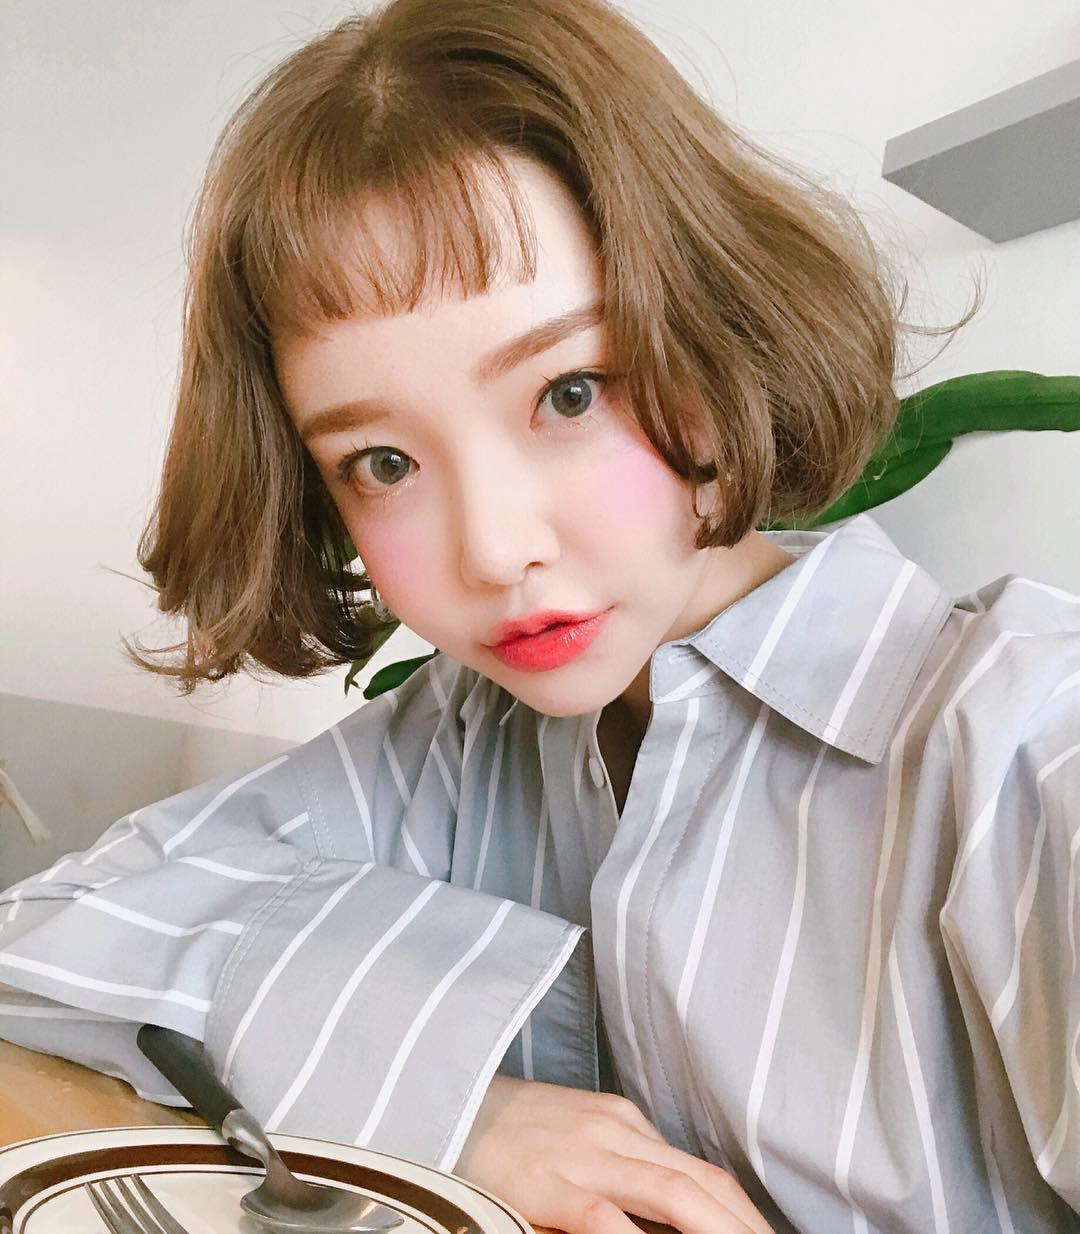 Hairstyle Girl Korea: 3 Popular Ways To Style Your Bangs Like Korean Girls